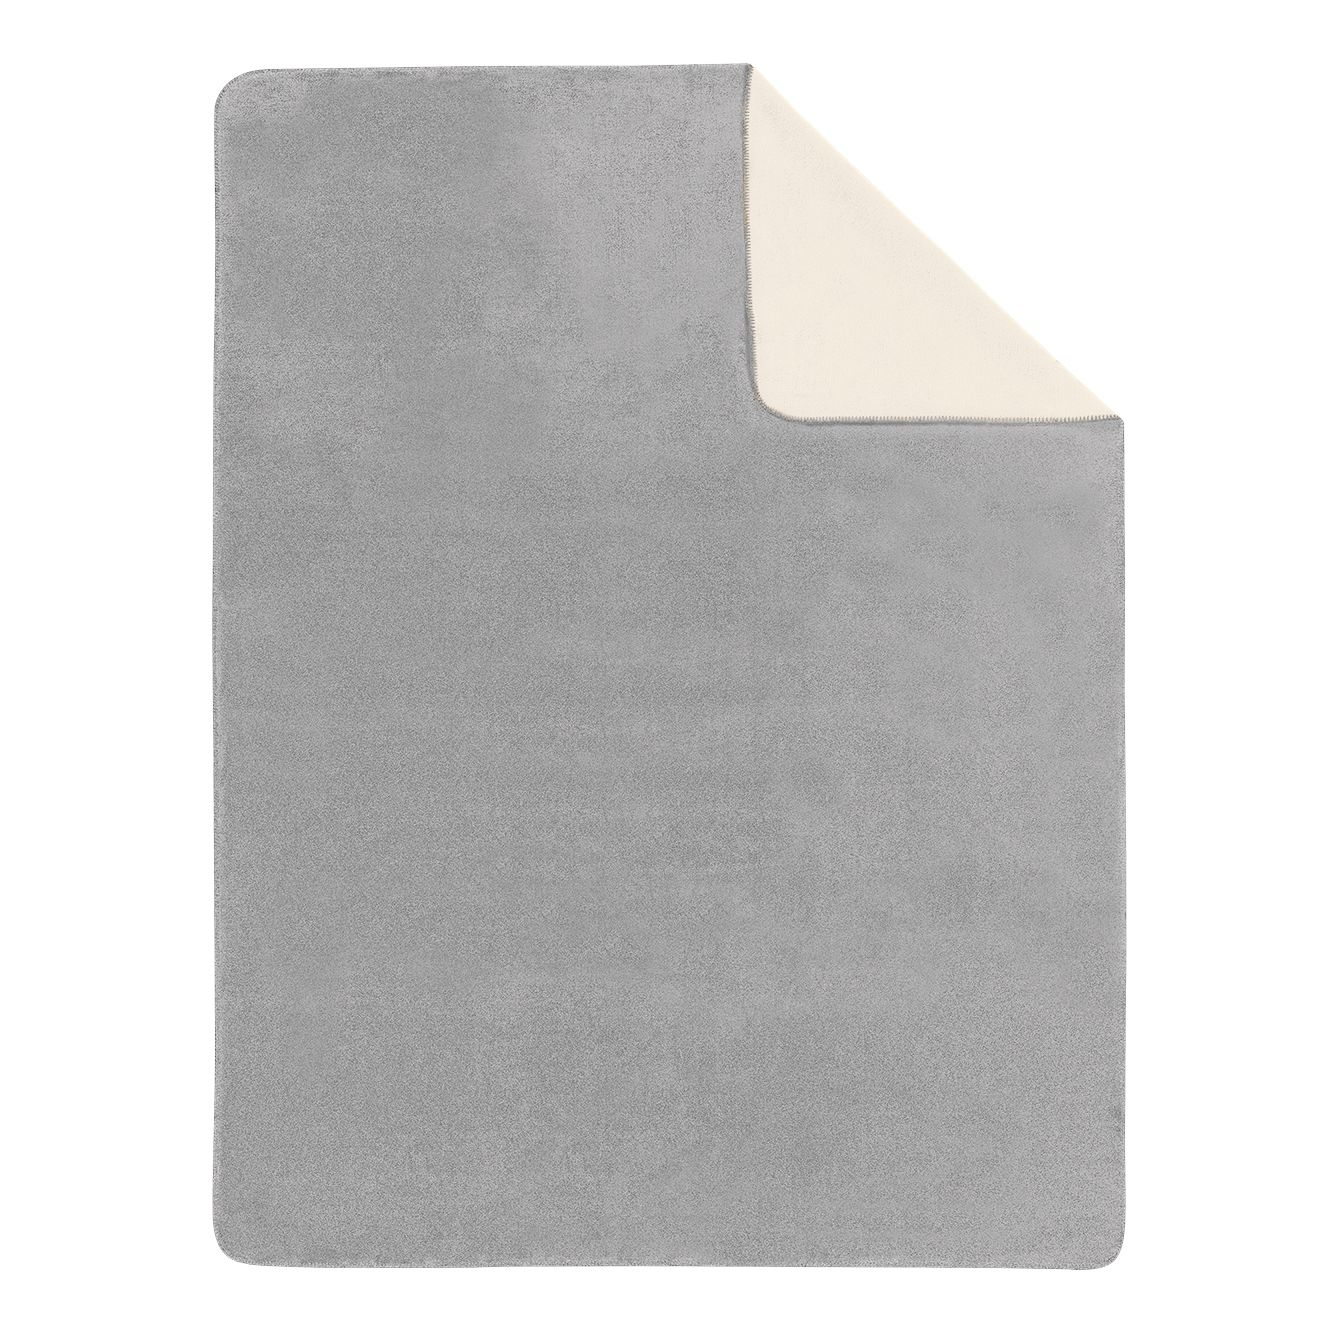 Image of Coperta a tinta unita Sorrento Doubleface - Grigio / Color crema - 150 x 200 cm, Ibena